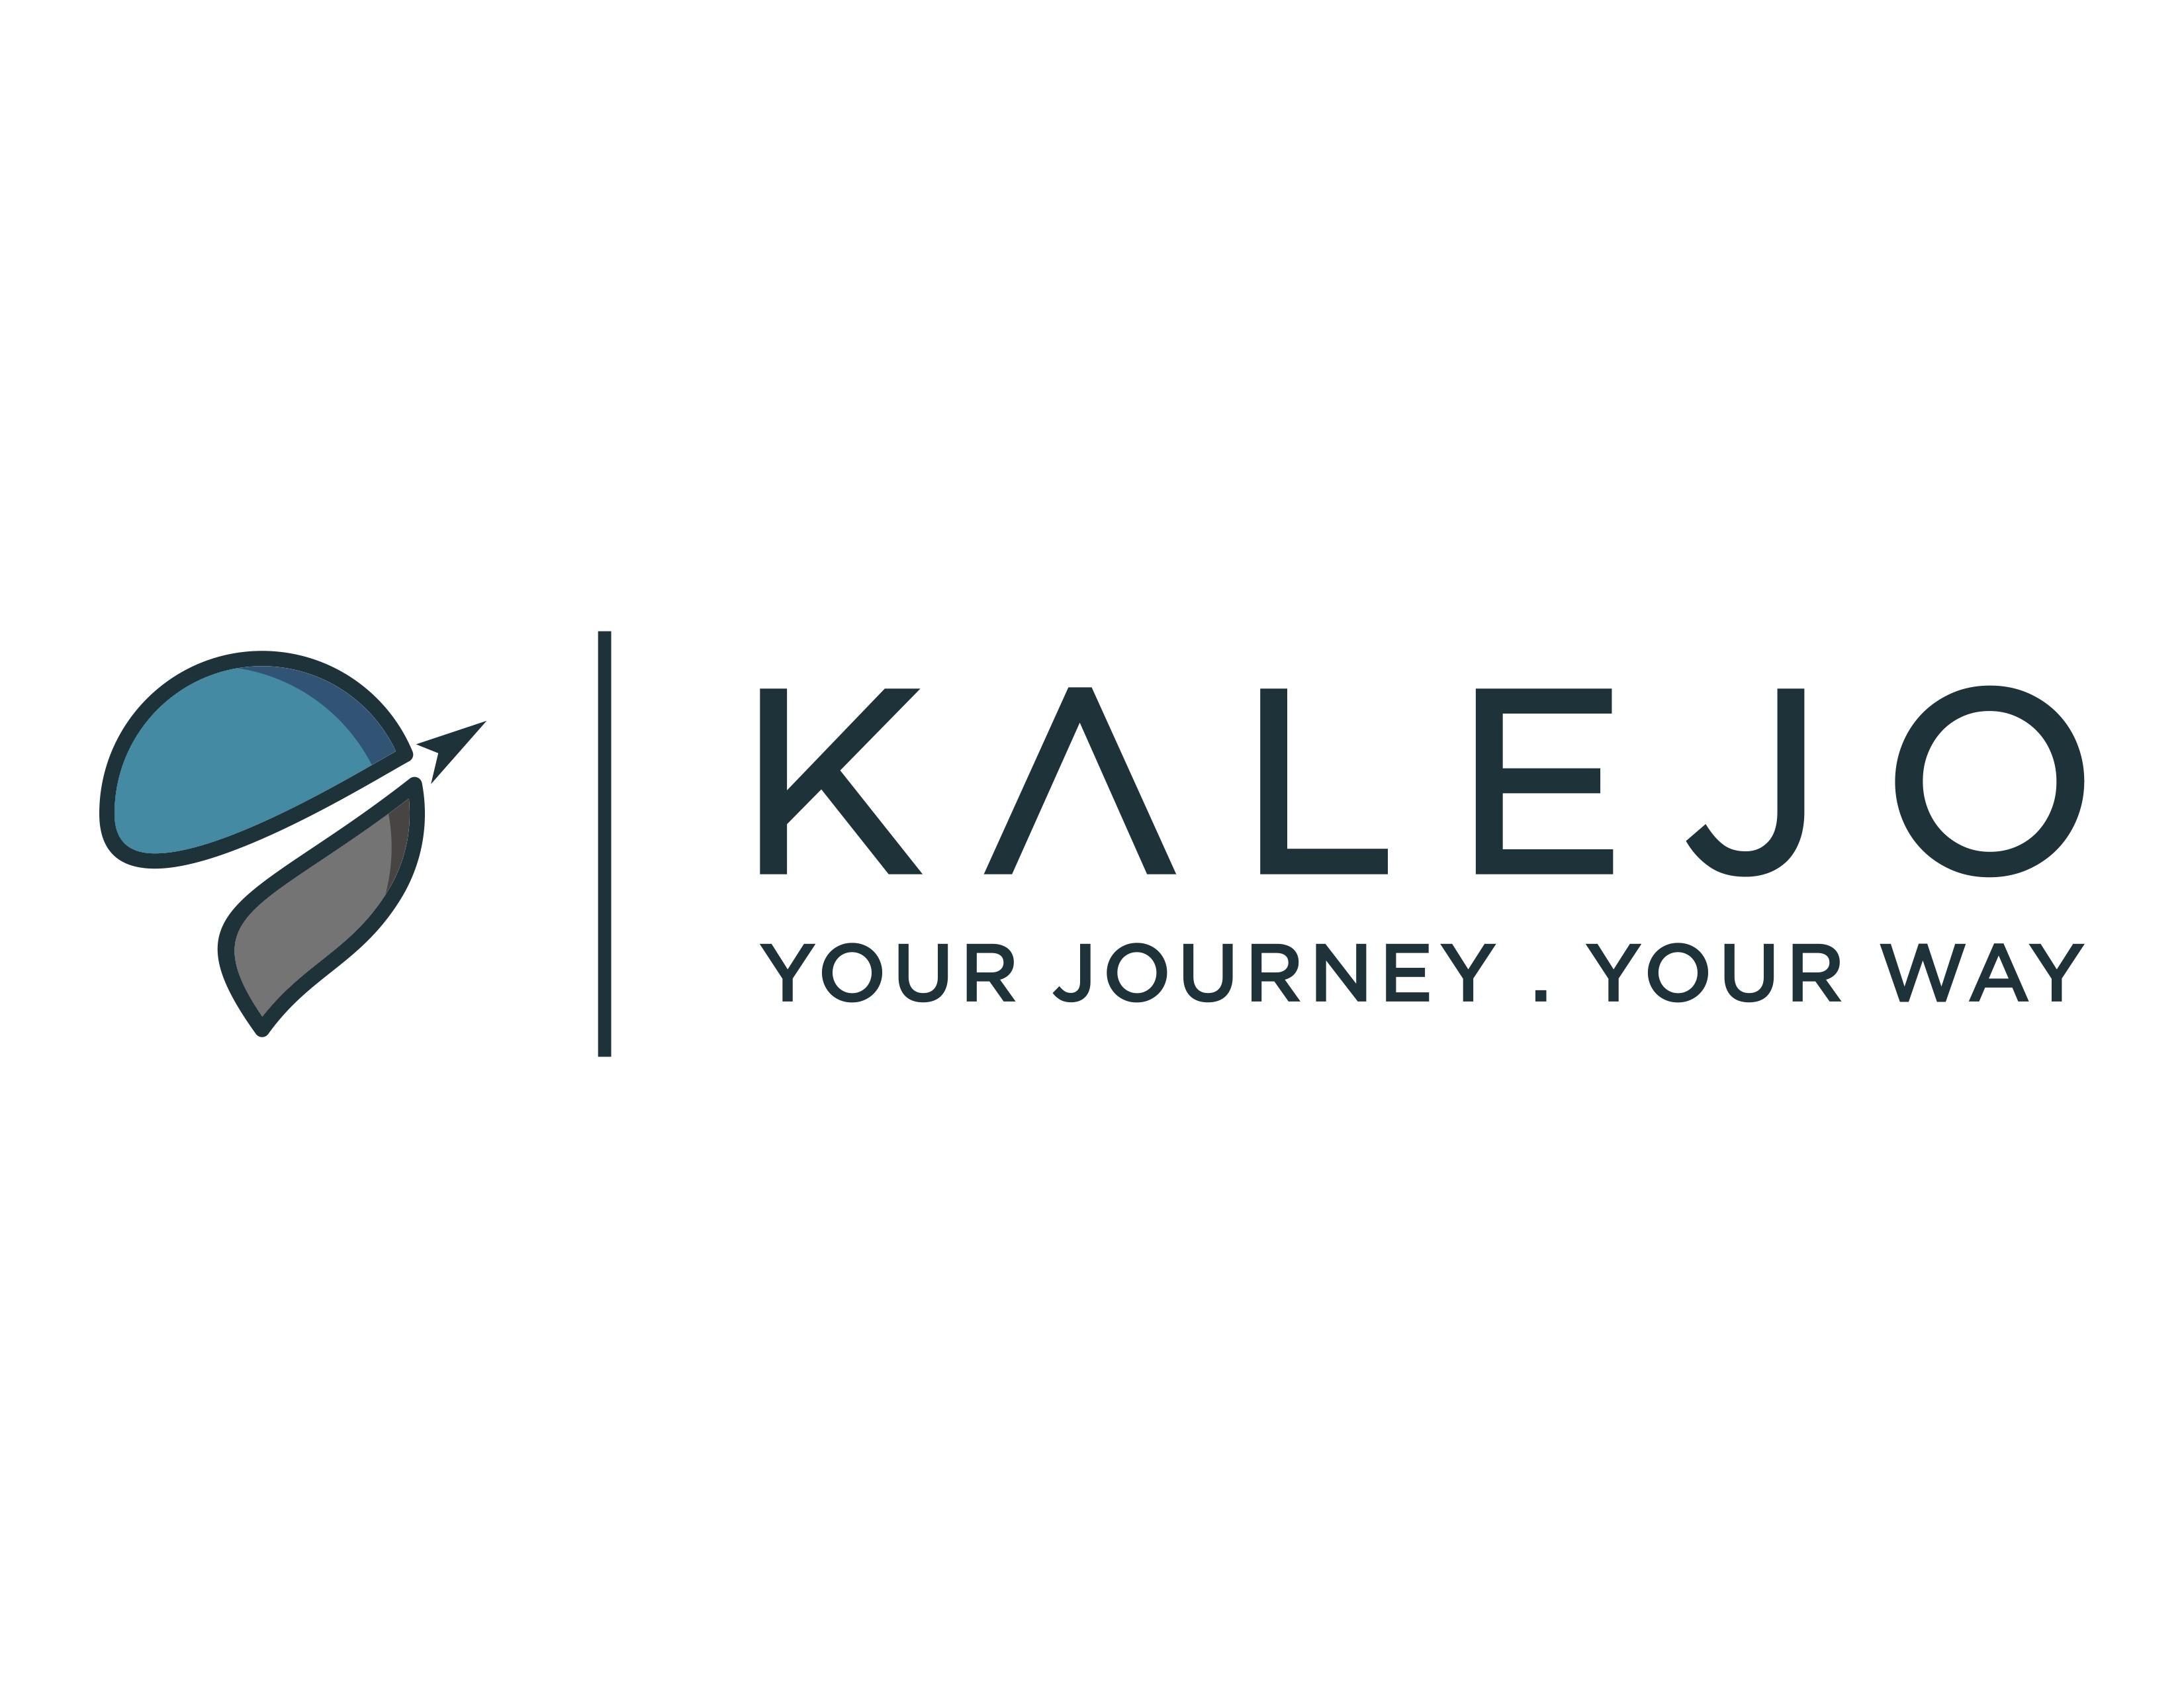 Travel site needs fresh modern logo to take off